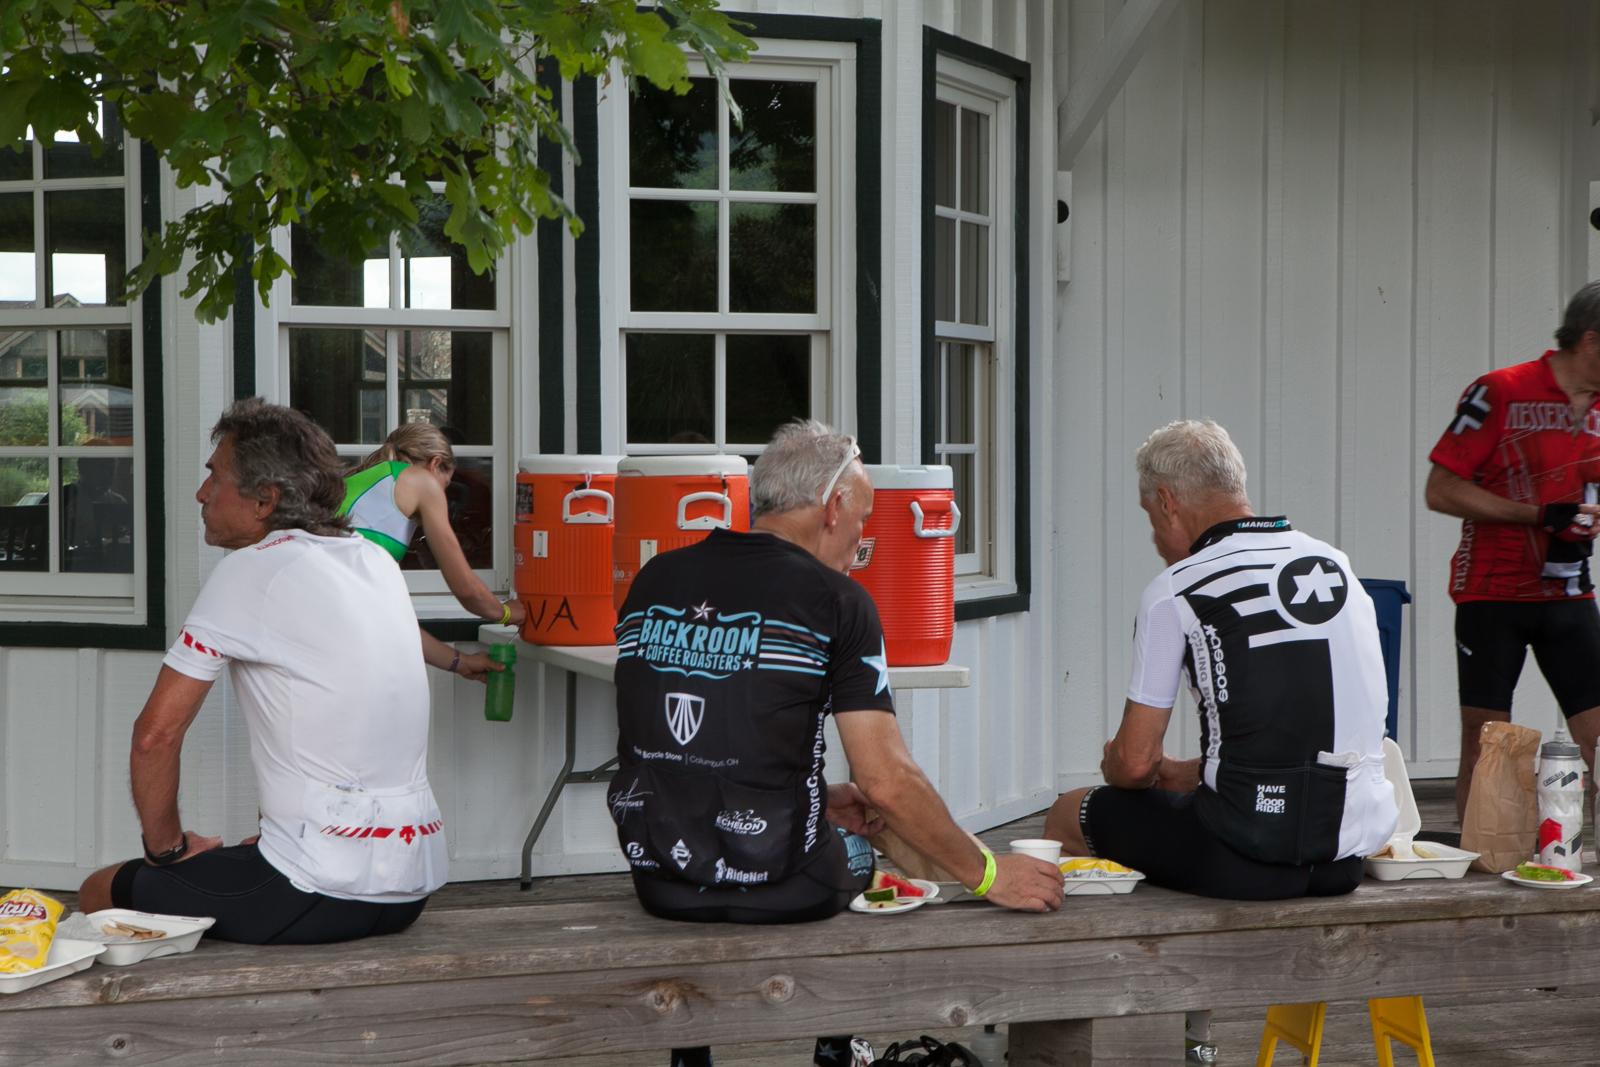 cyclists outside building on bike virginia tour